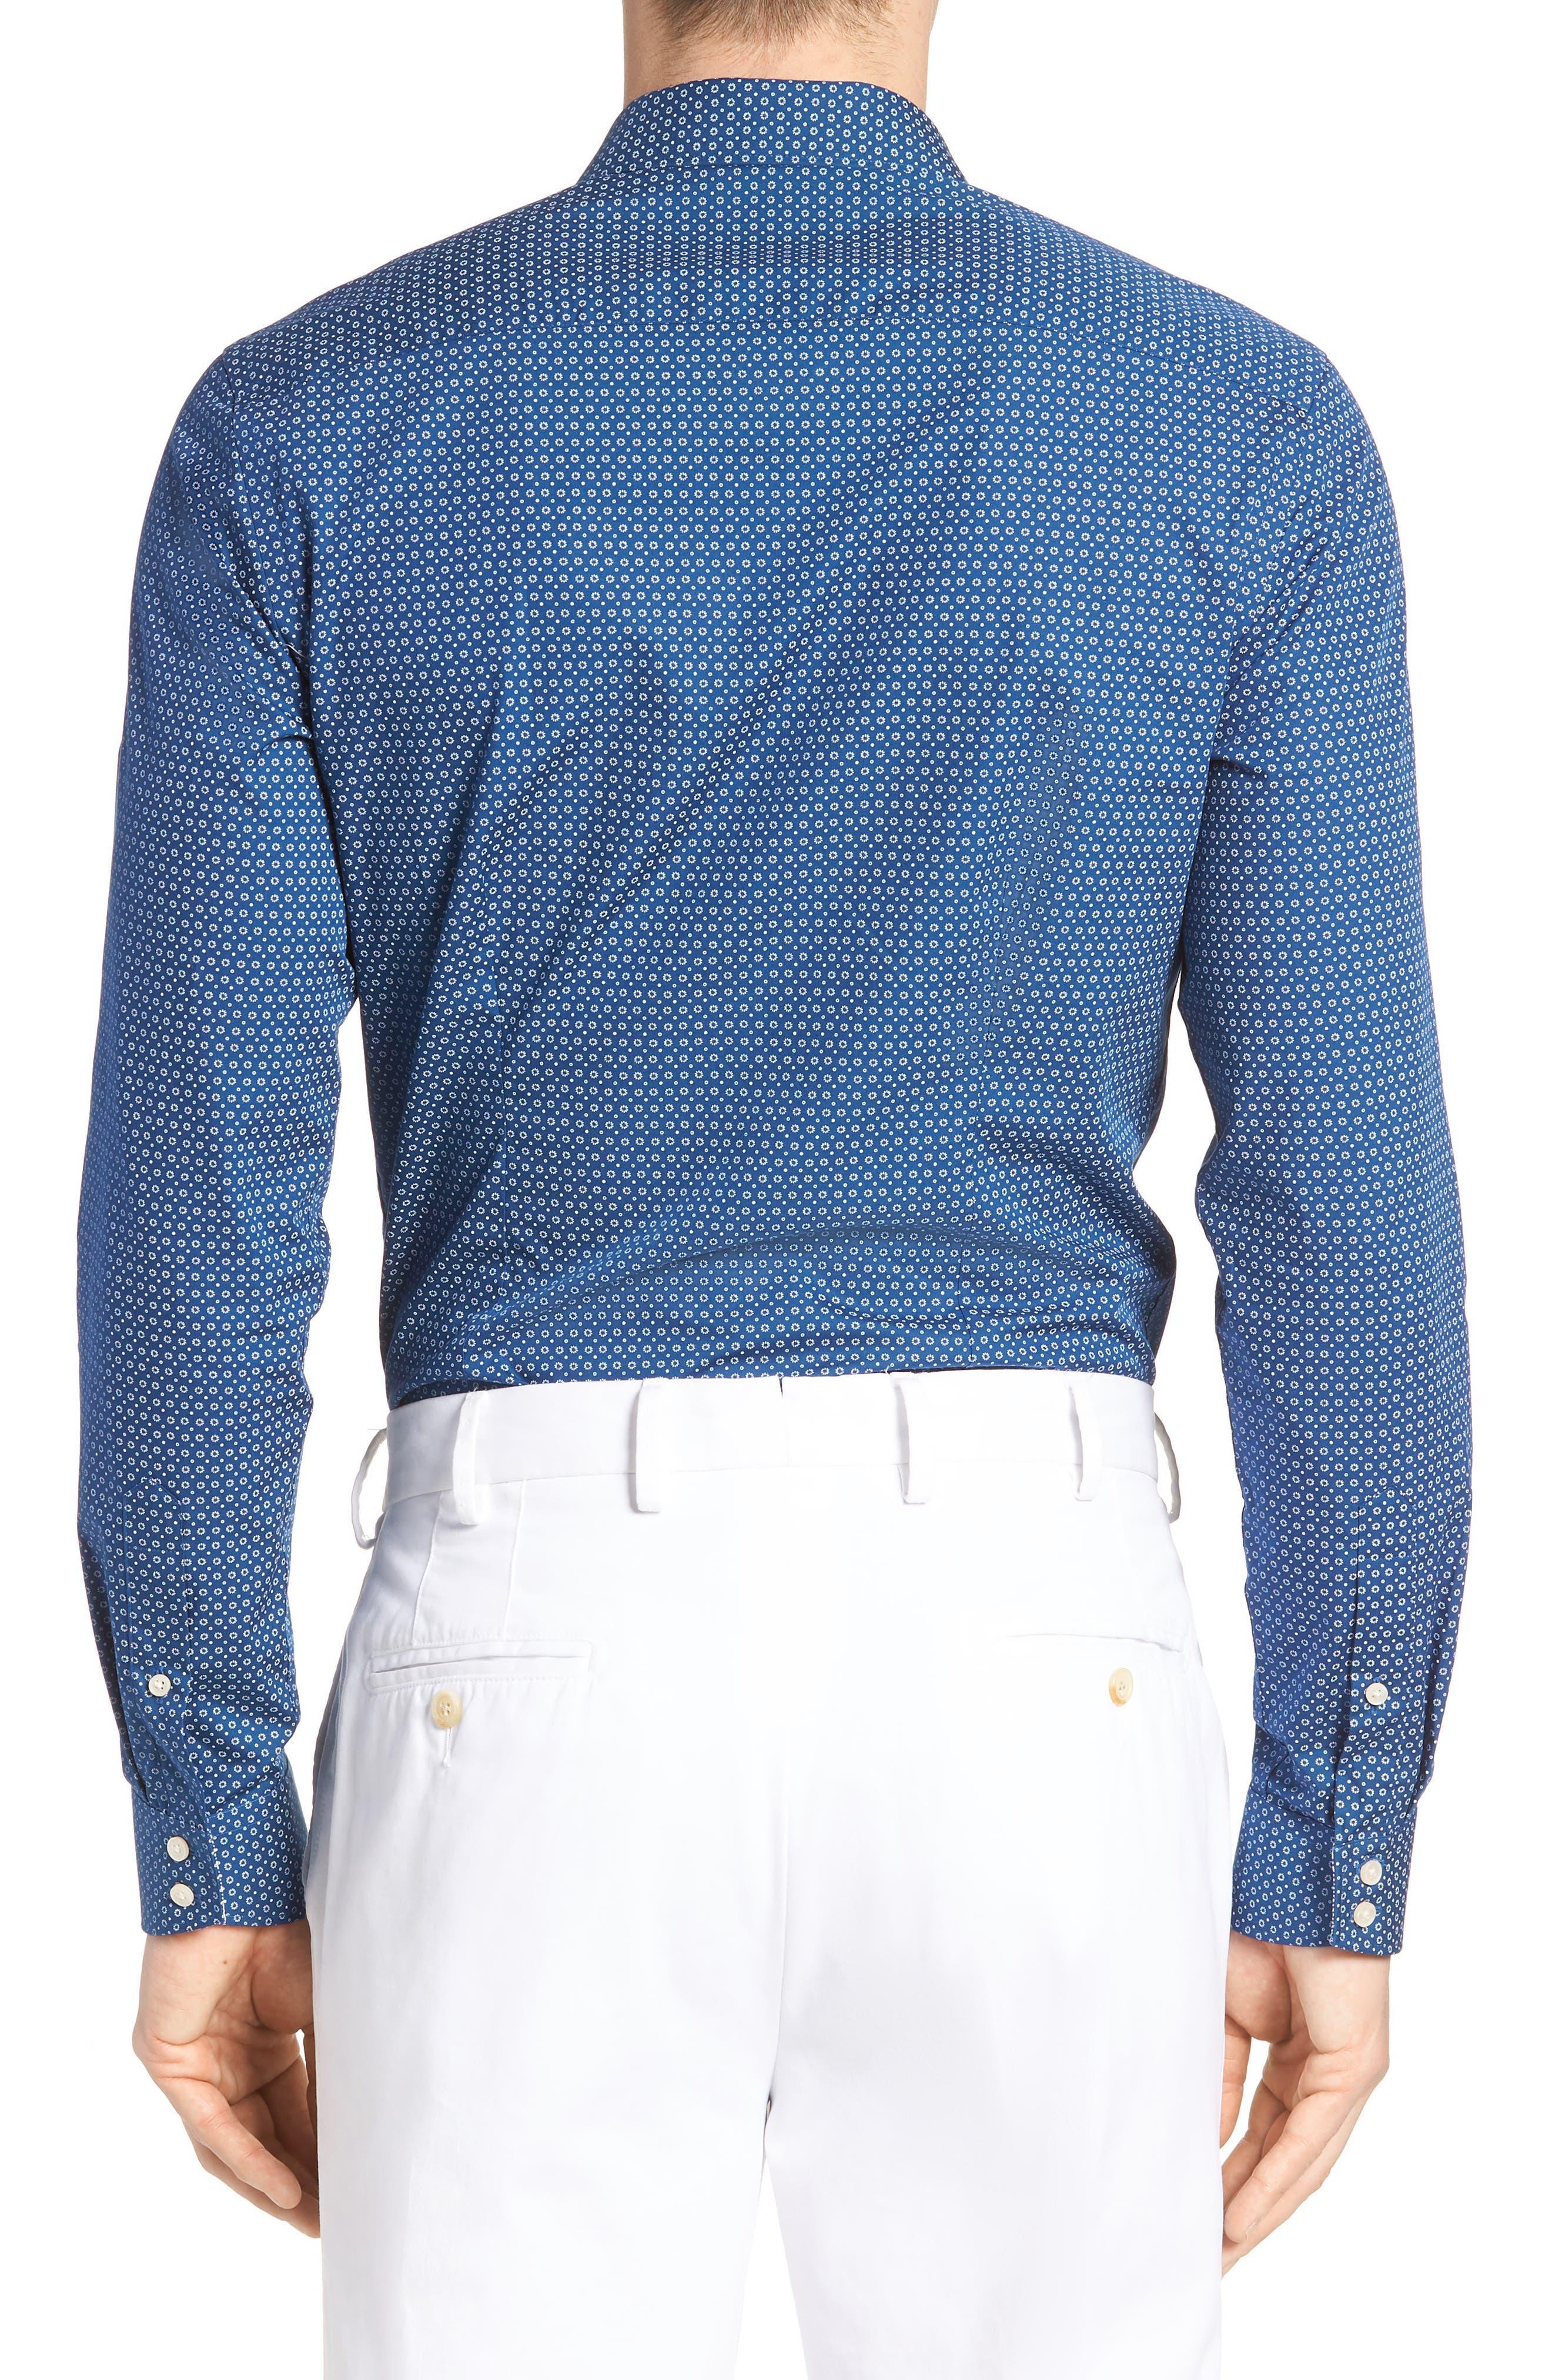 Loops Slim Fit Dress Shirt,                             Alternate thumbnail 2, color,                             Navy